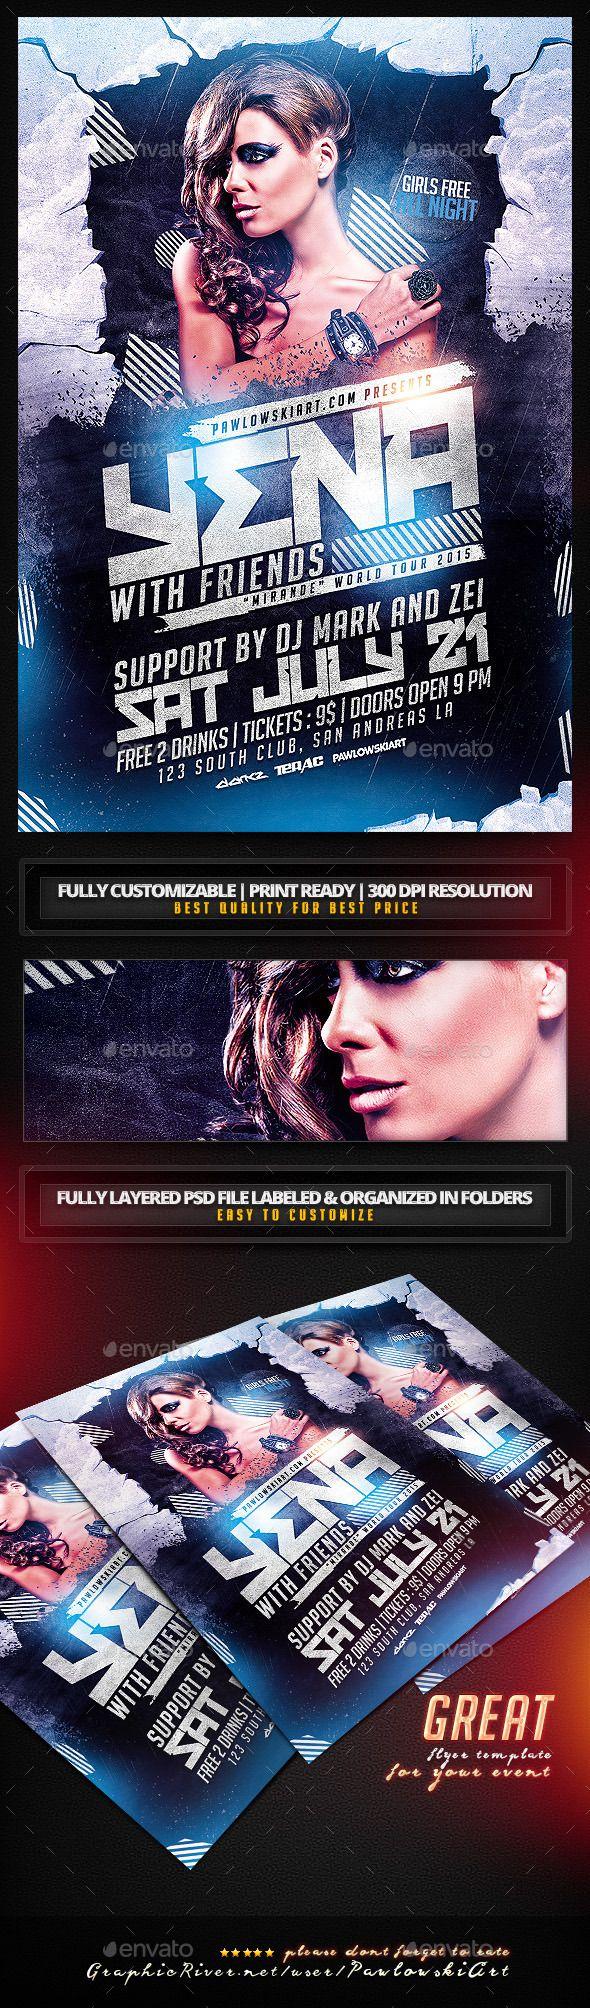 Album Promo DJ Mix PSD Flyer Template - Clubs & Parties Events